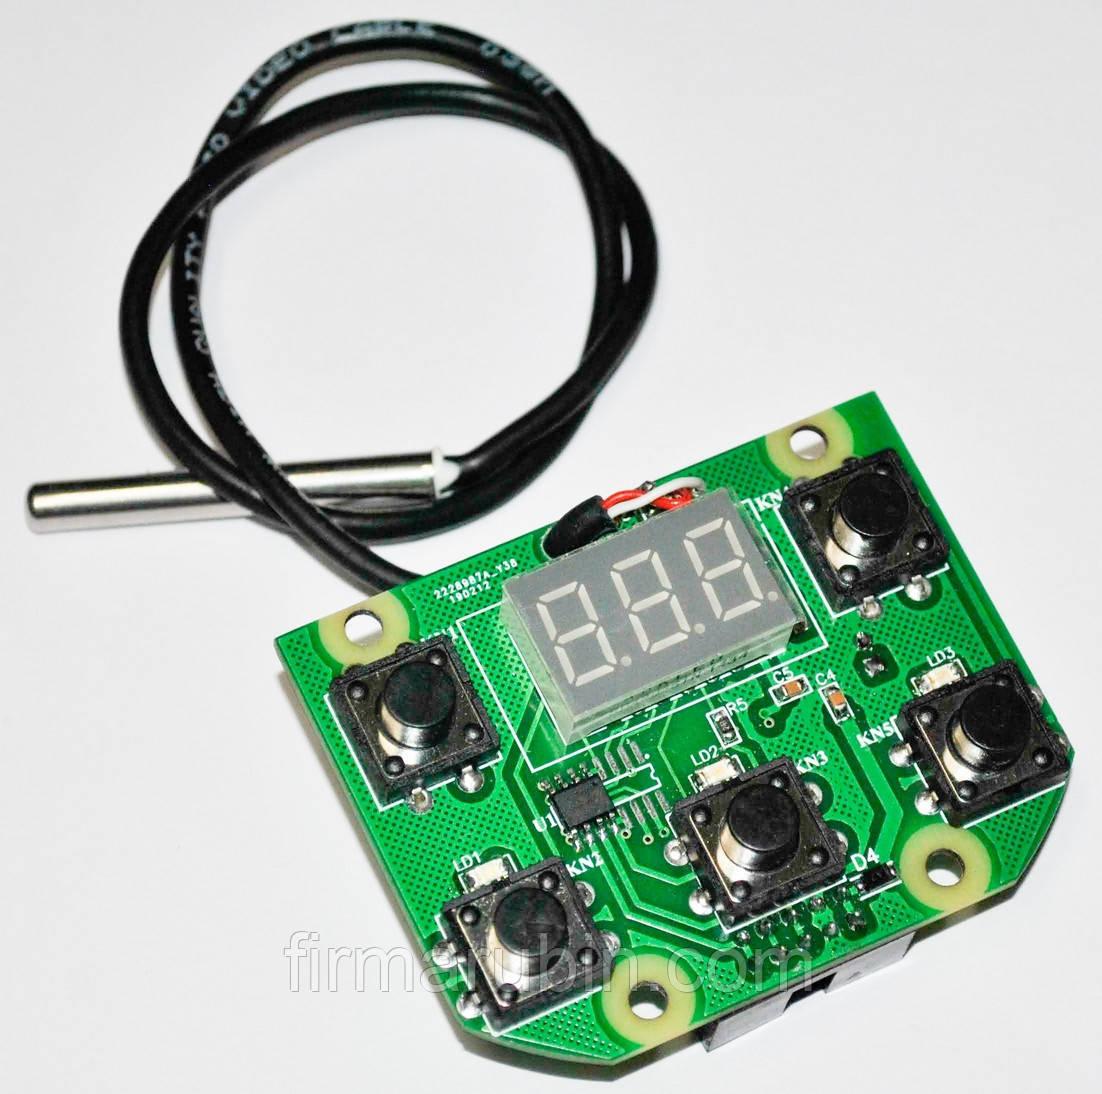 Терморегулятор TRW3005 (12V)